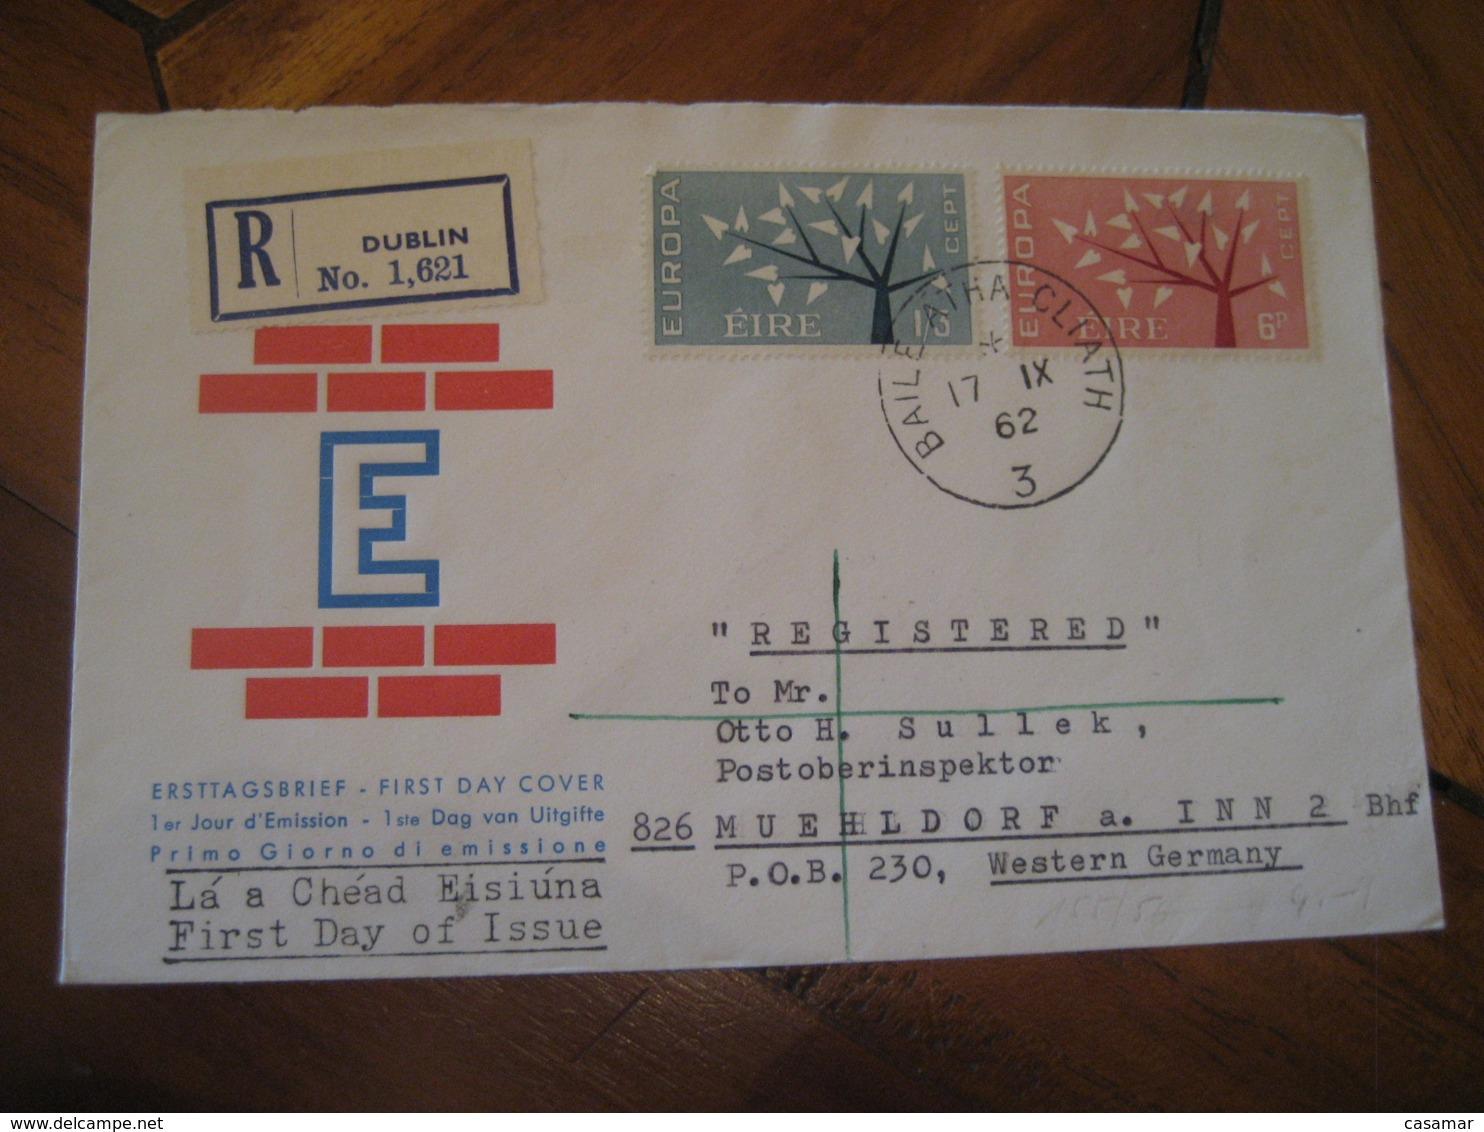 DUBLIN 1962 To Muehldorf Western Germany Europa Cept FDC Cancel Cover IRELAND Eire - 1949-... Republic Of Ireland